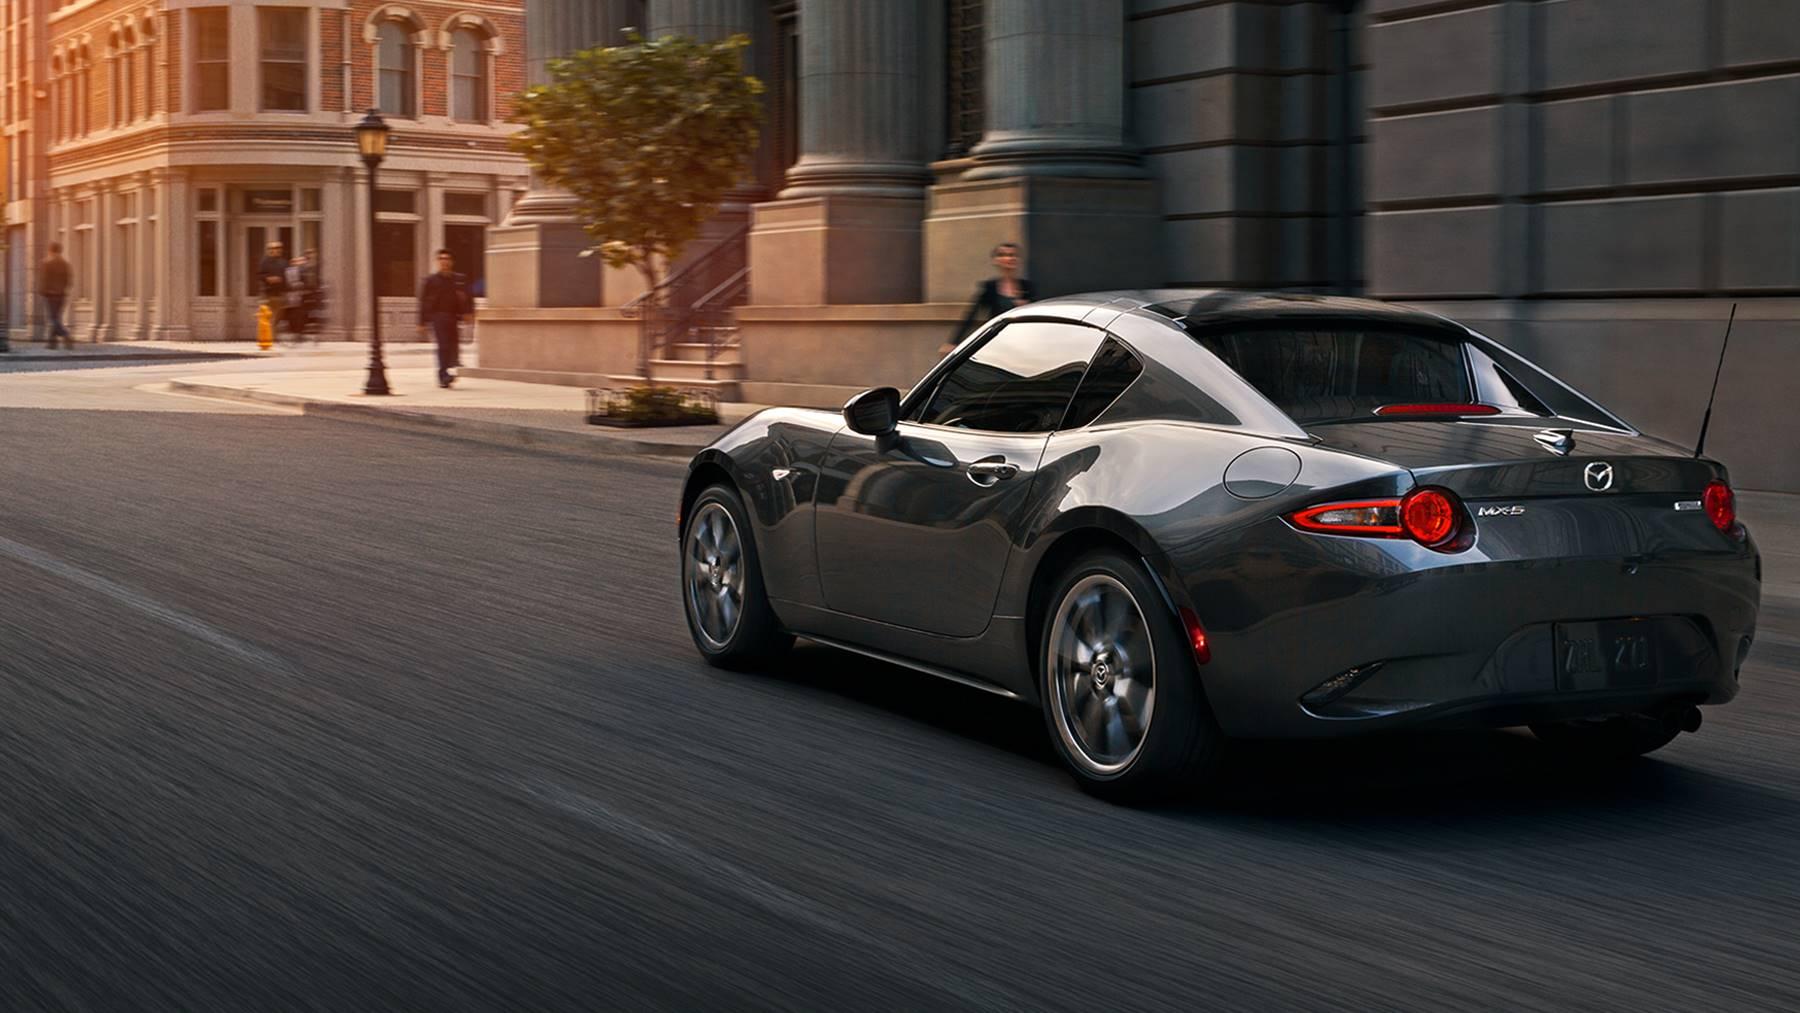 Mx 5 Rf >> Mazda Mx 5 Rf Kuvagalleria